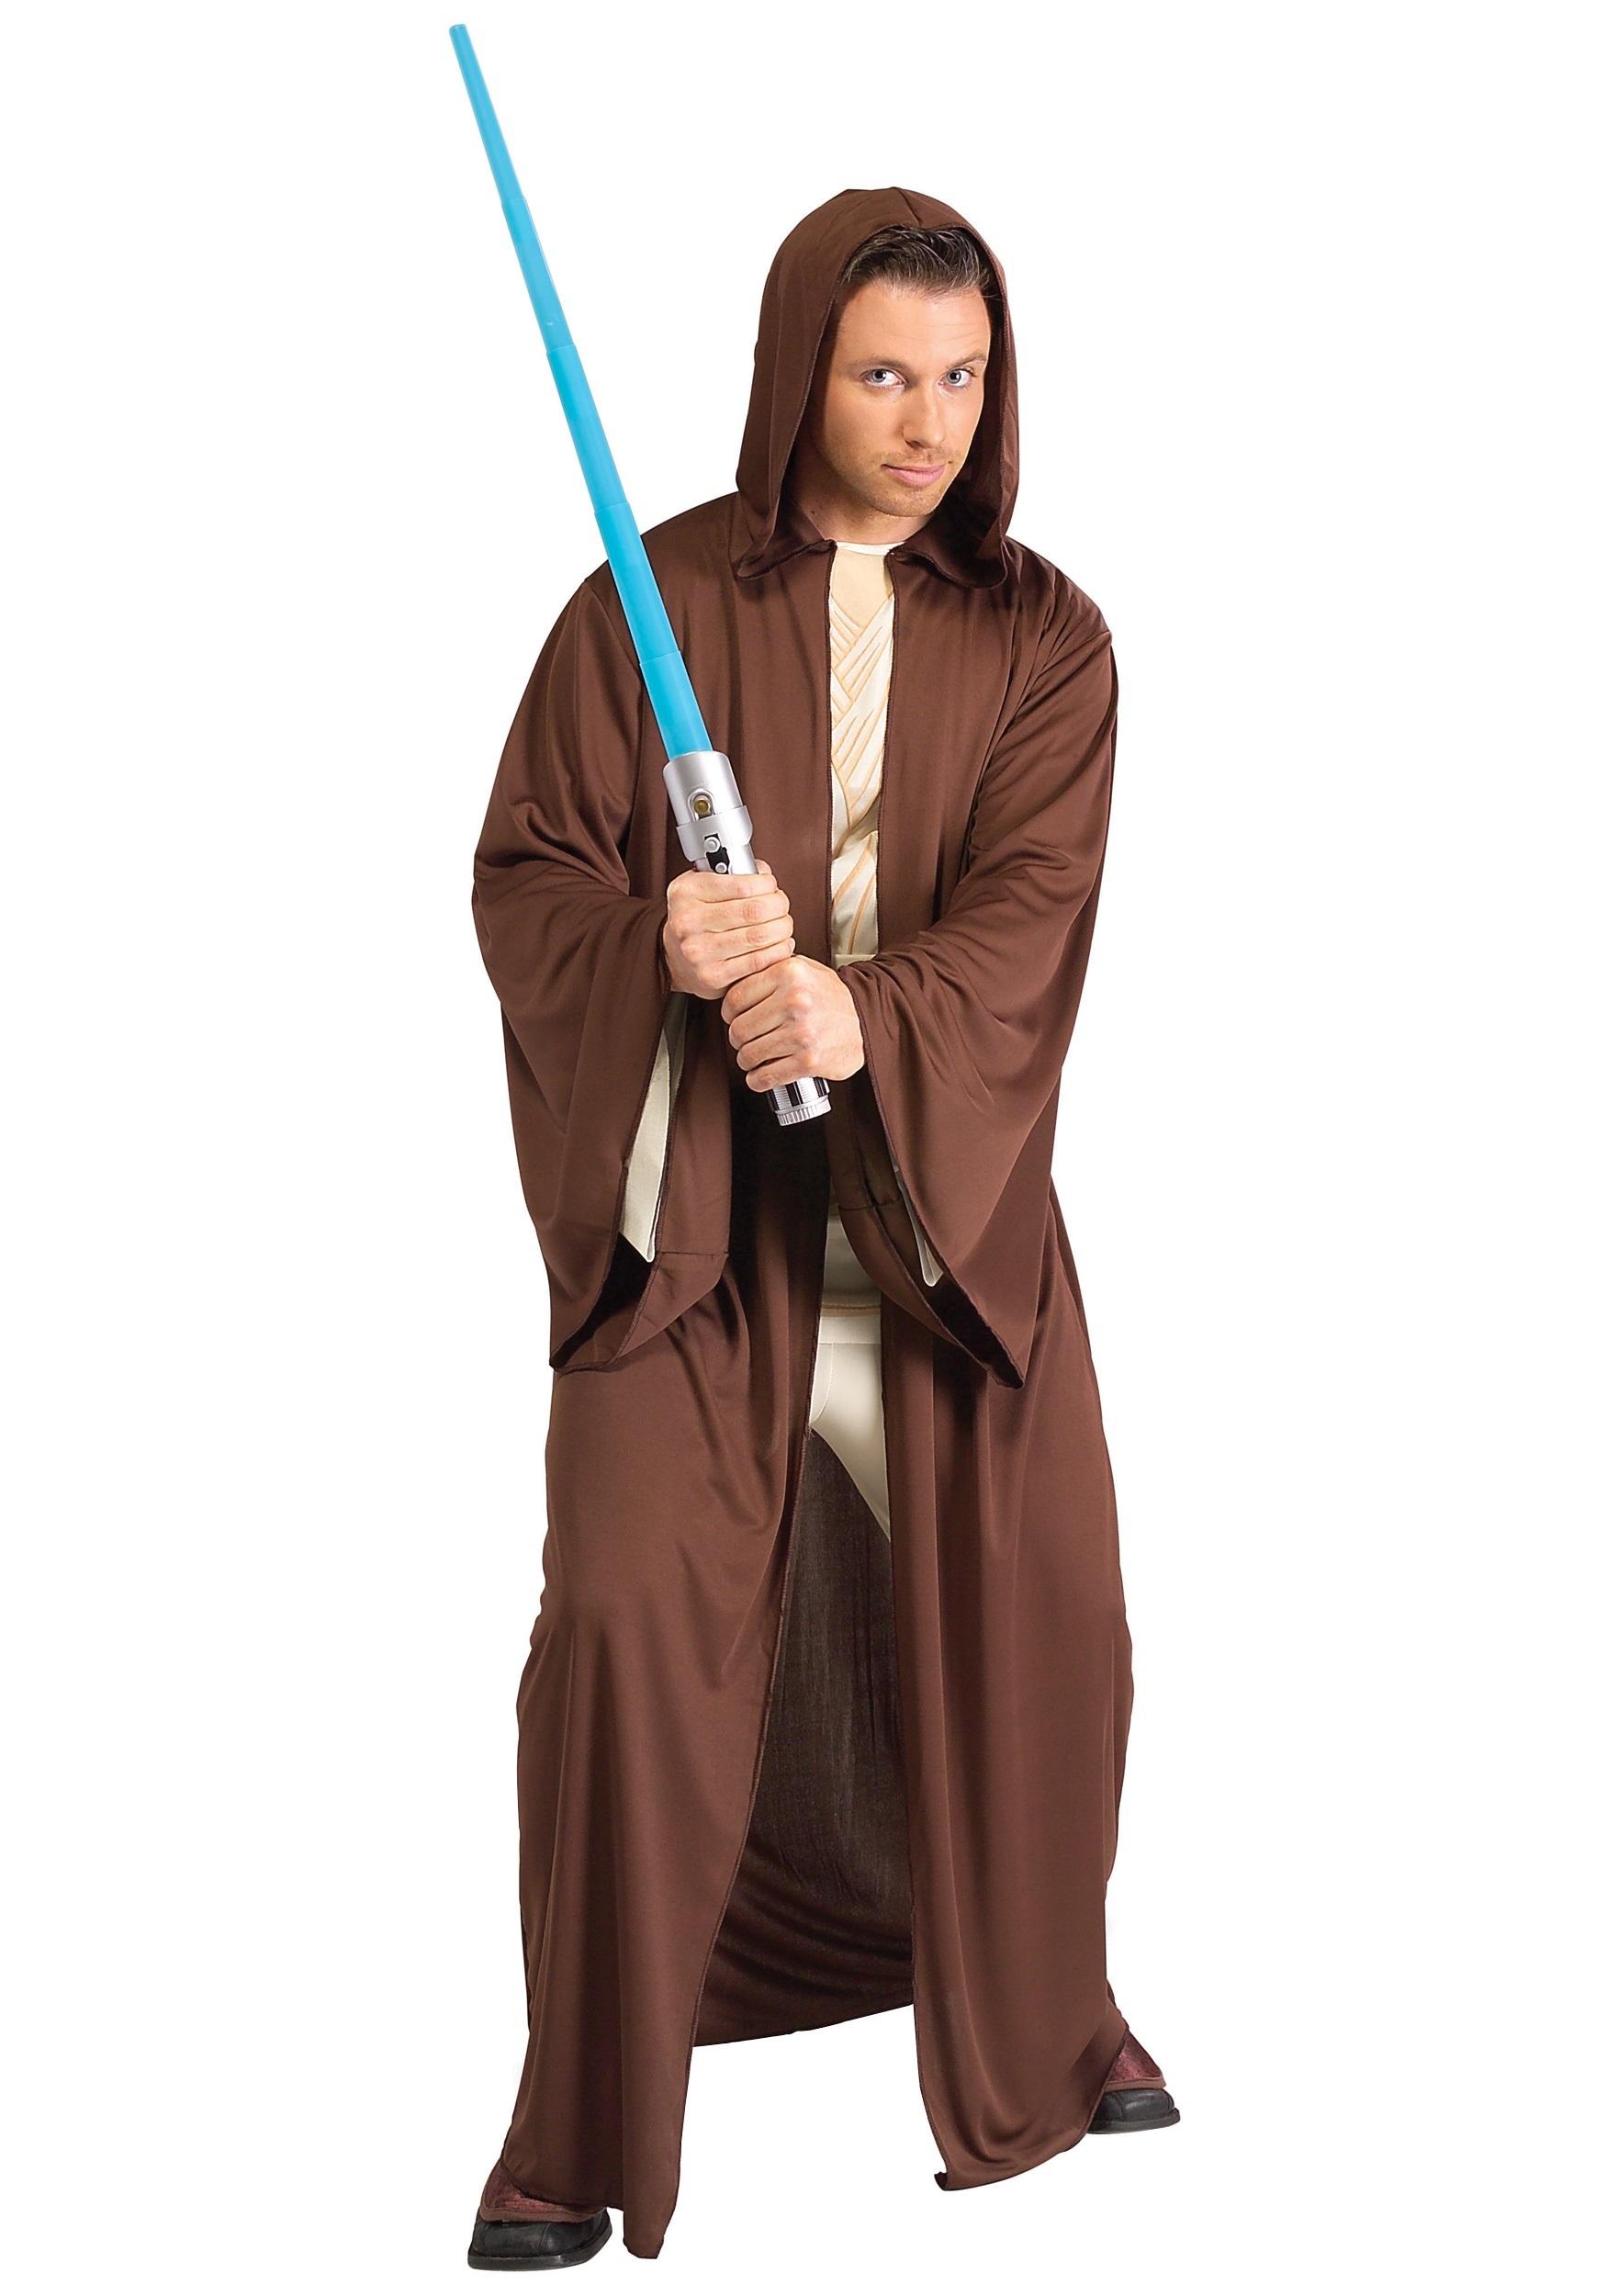 Kids Deluxe Anakin Skywalker Costume. £36.99. Plus Size Jedi Robe  sc 1 st  Halloween Costumes UK & Anakin Skywalker Costumes - Adult Child Kids Star Wars Halloween ...